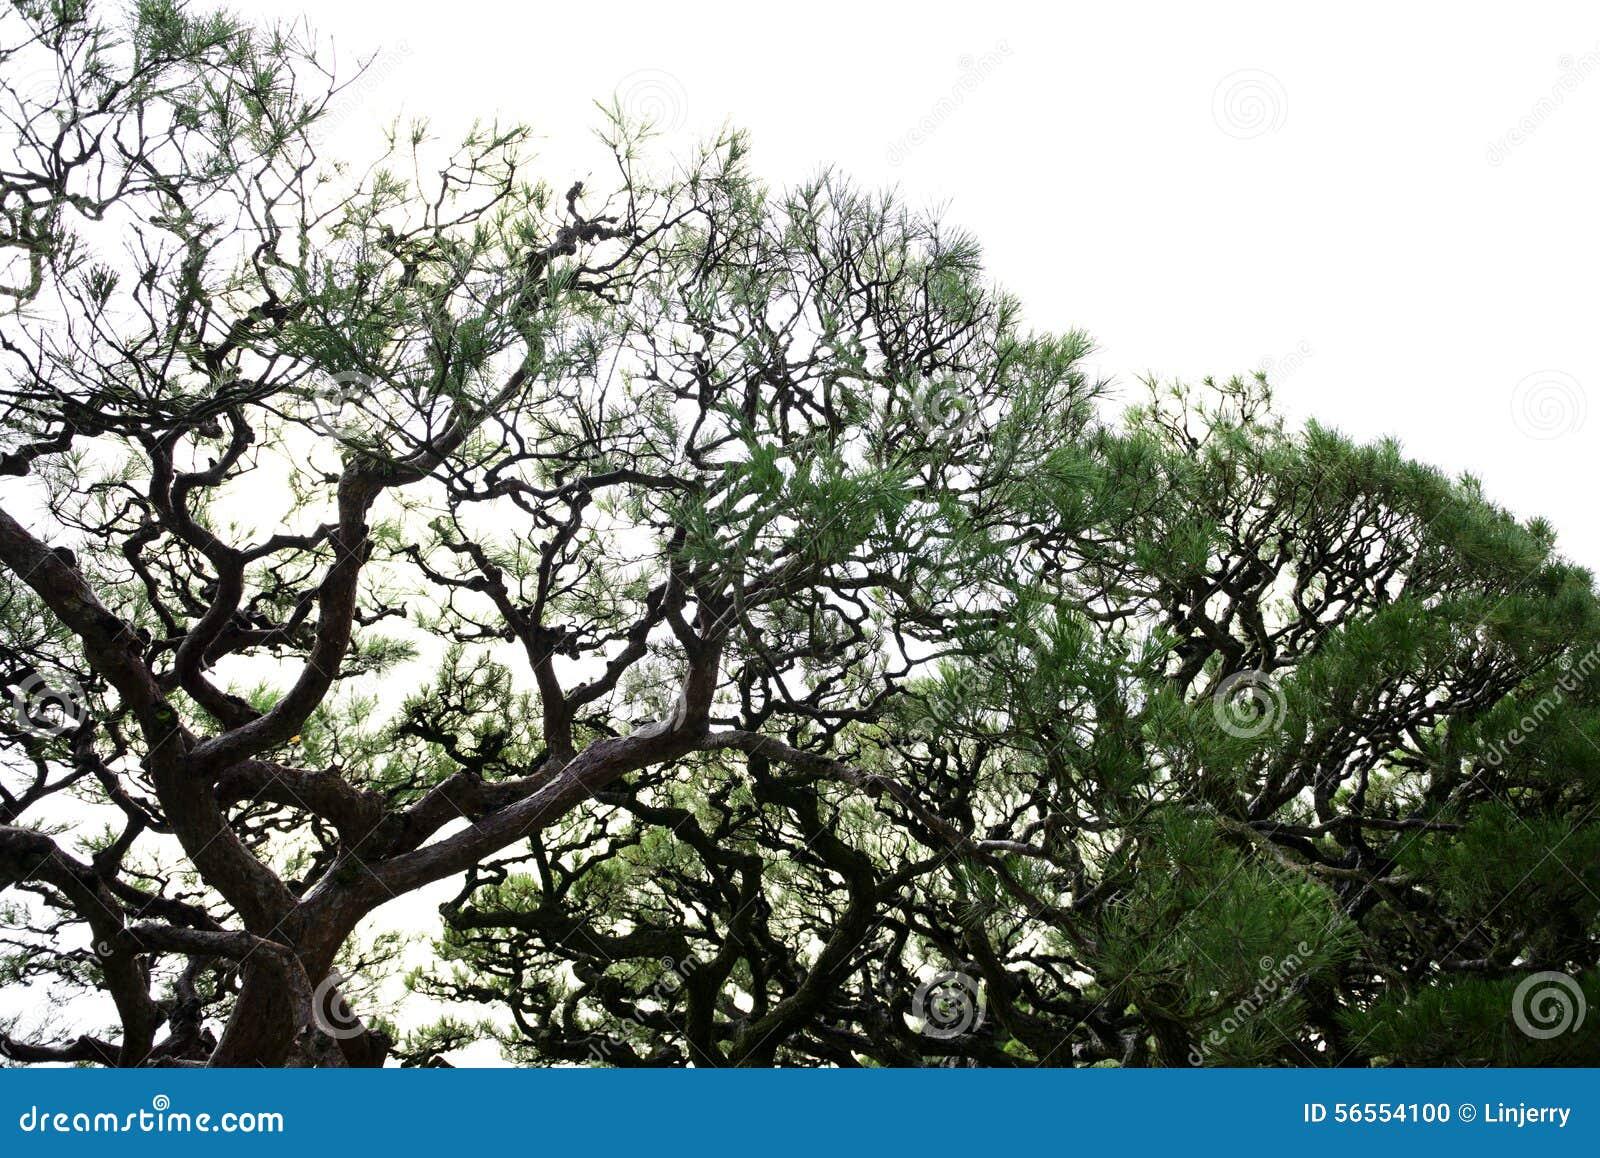 Download Όμορφο ιαπωνικό δέντρο κήπων Στοκ Εικόνες - εικόνα από τουρισμός, χαλαρώστε: 56554100